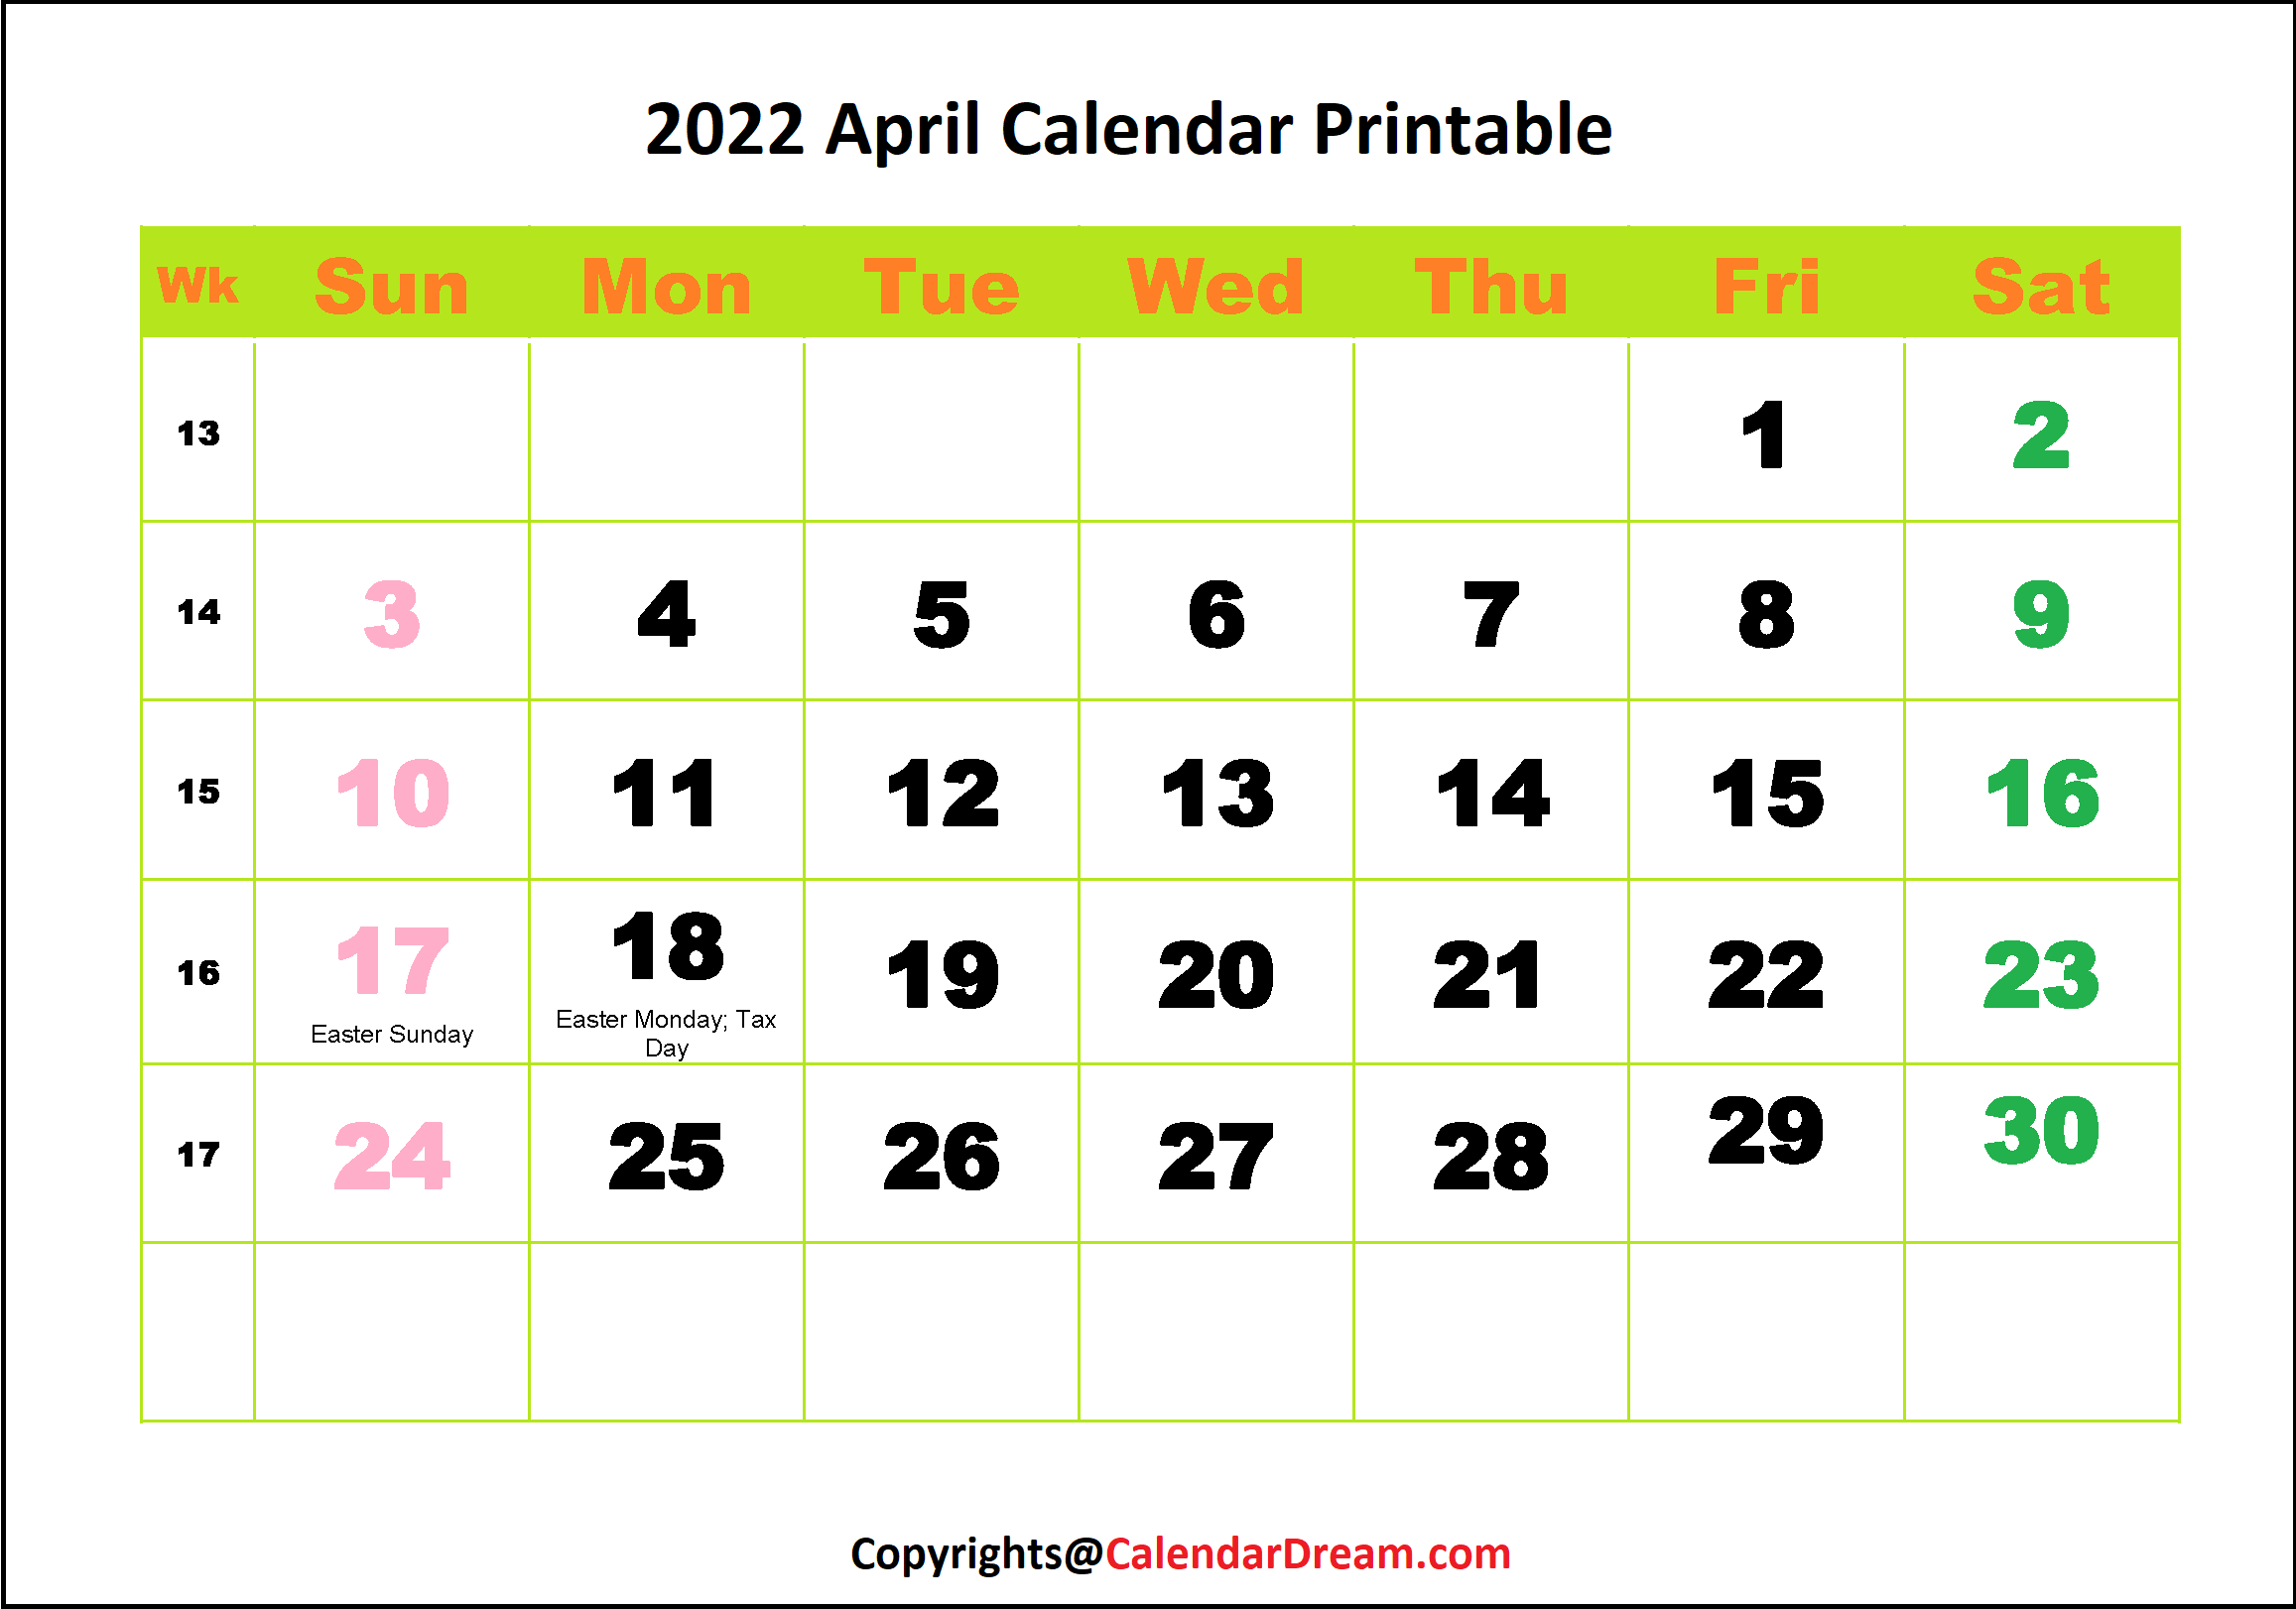 2022 April Calendar Printable PDF